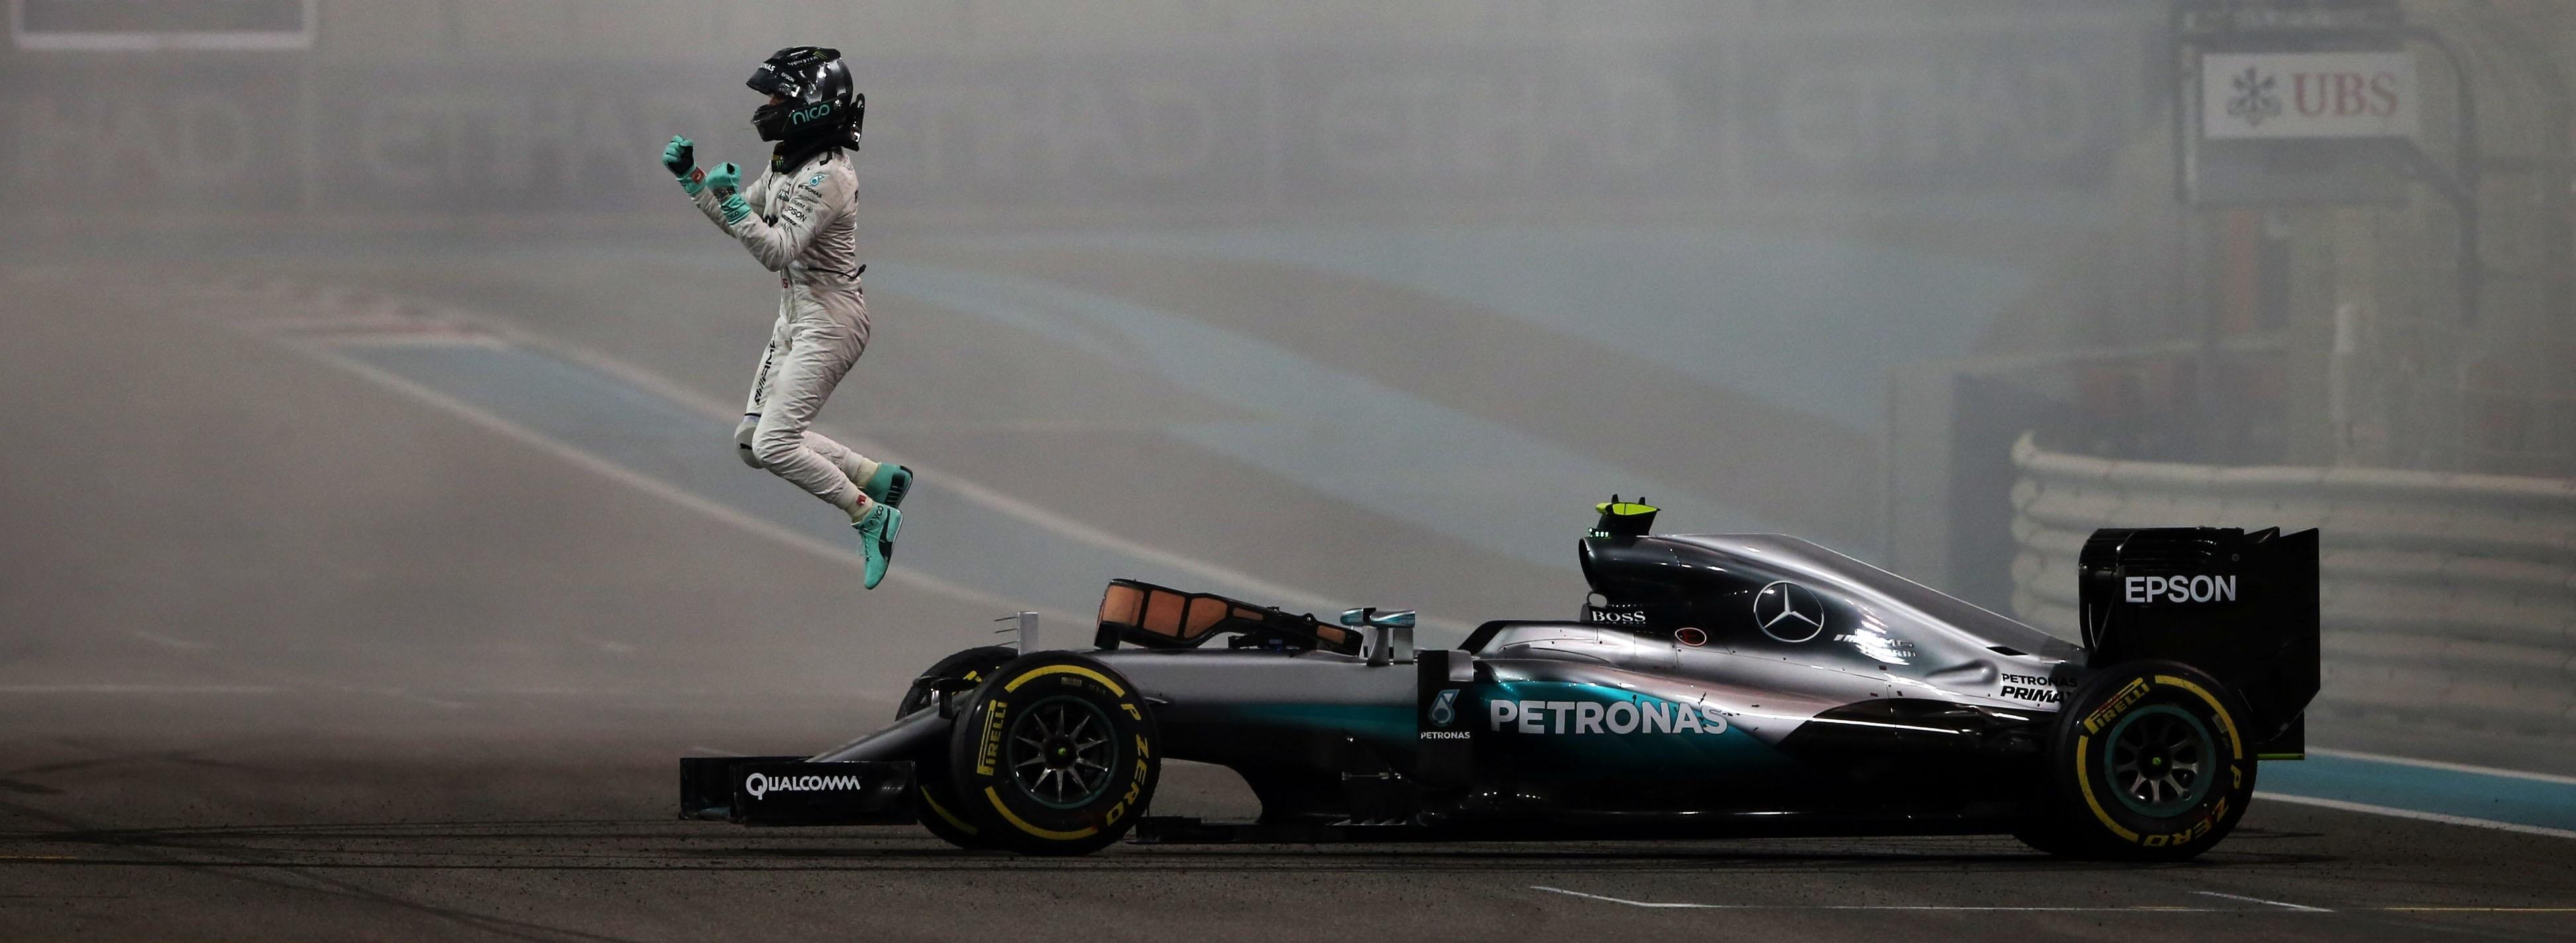 Nico Rosberg GP Abu Dhabi 2016 Celebración